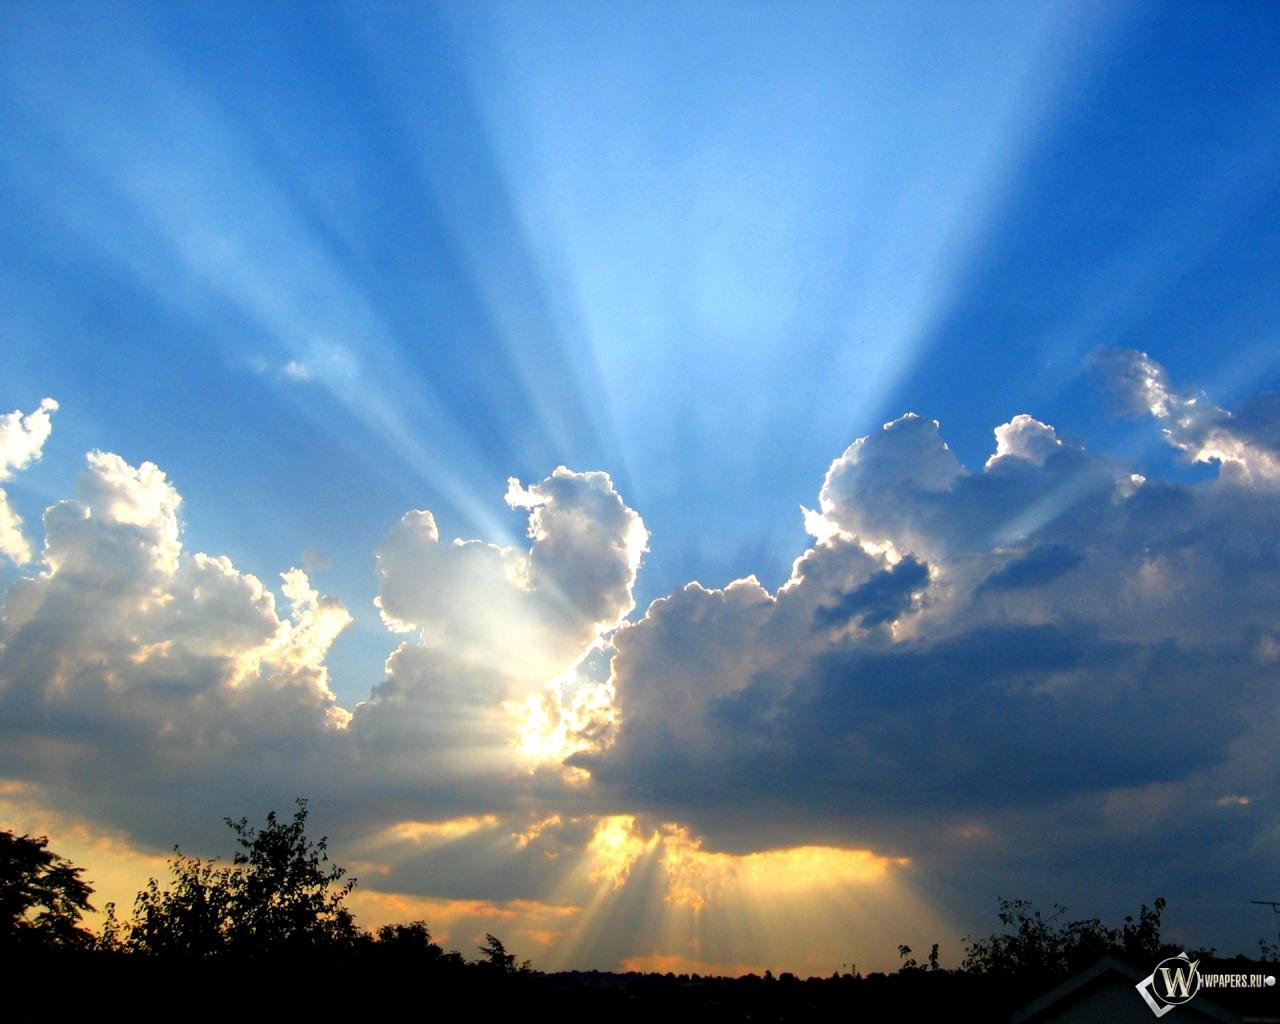 Обои, Чистое небо, Свет, Природа ...: wpapers.ru/wallpapers/nature/Landscapes/7604/1280-1024_Чистое...